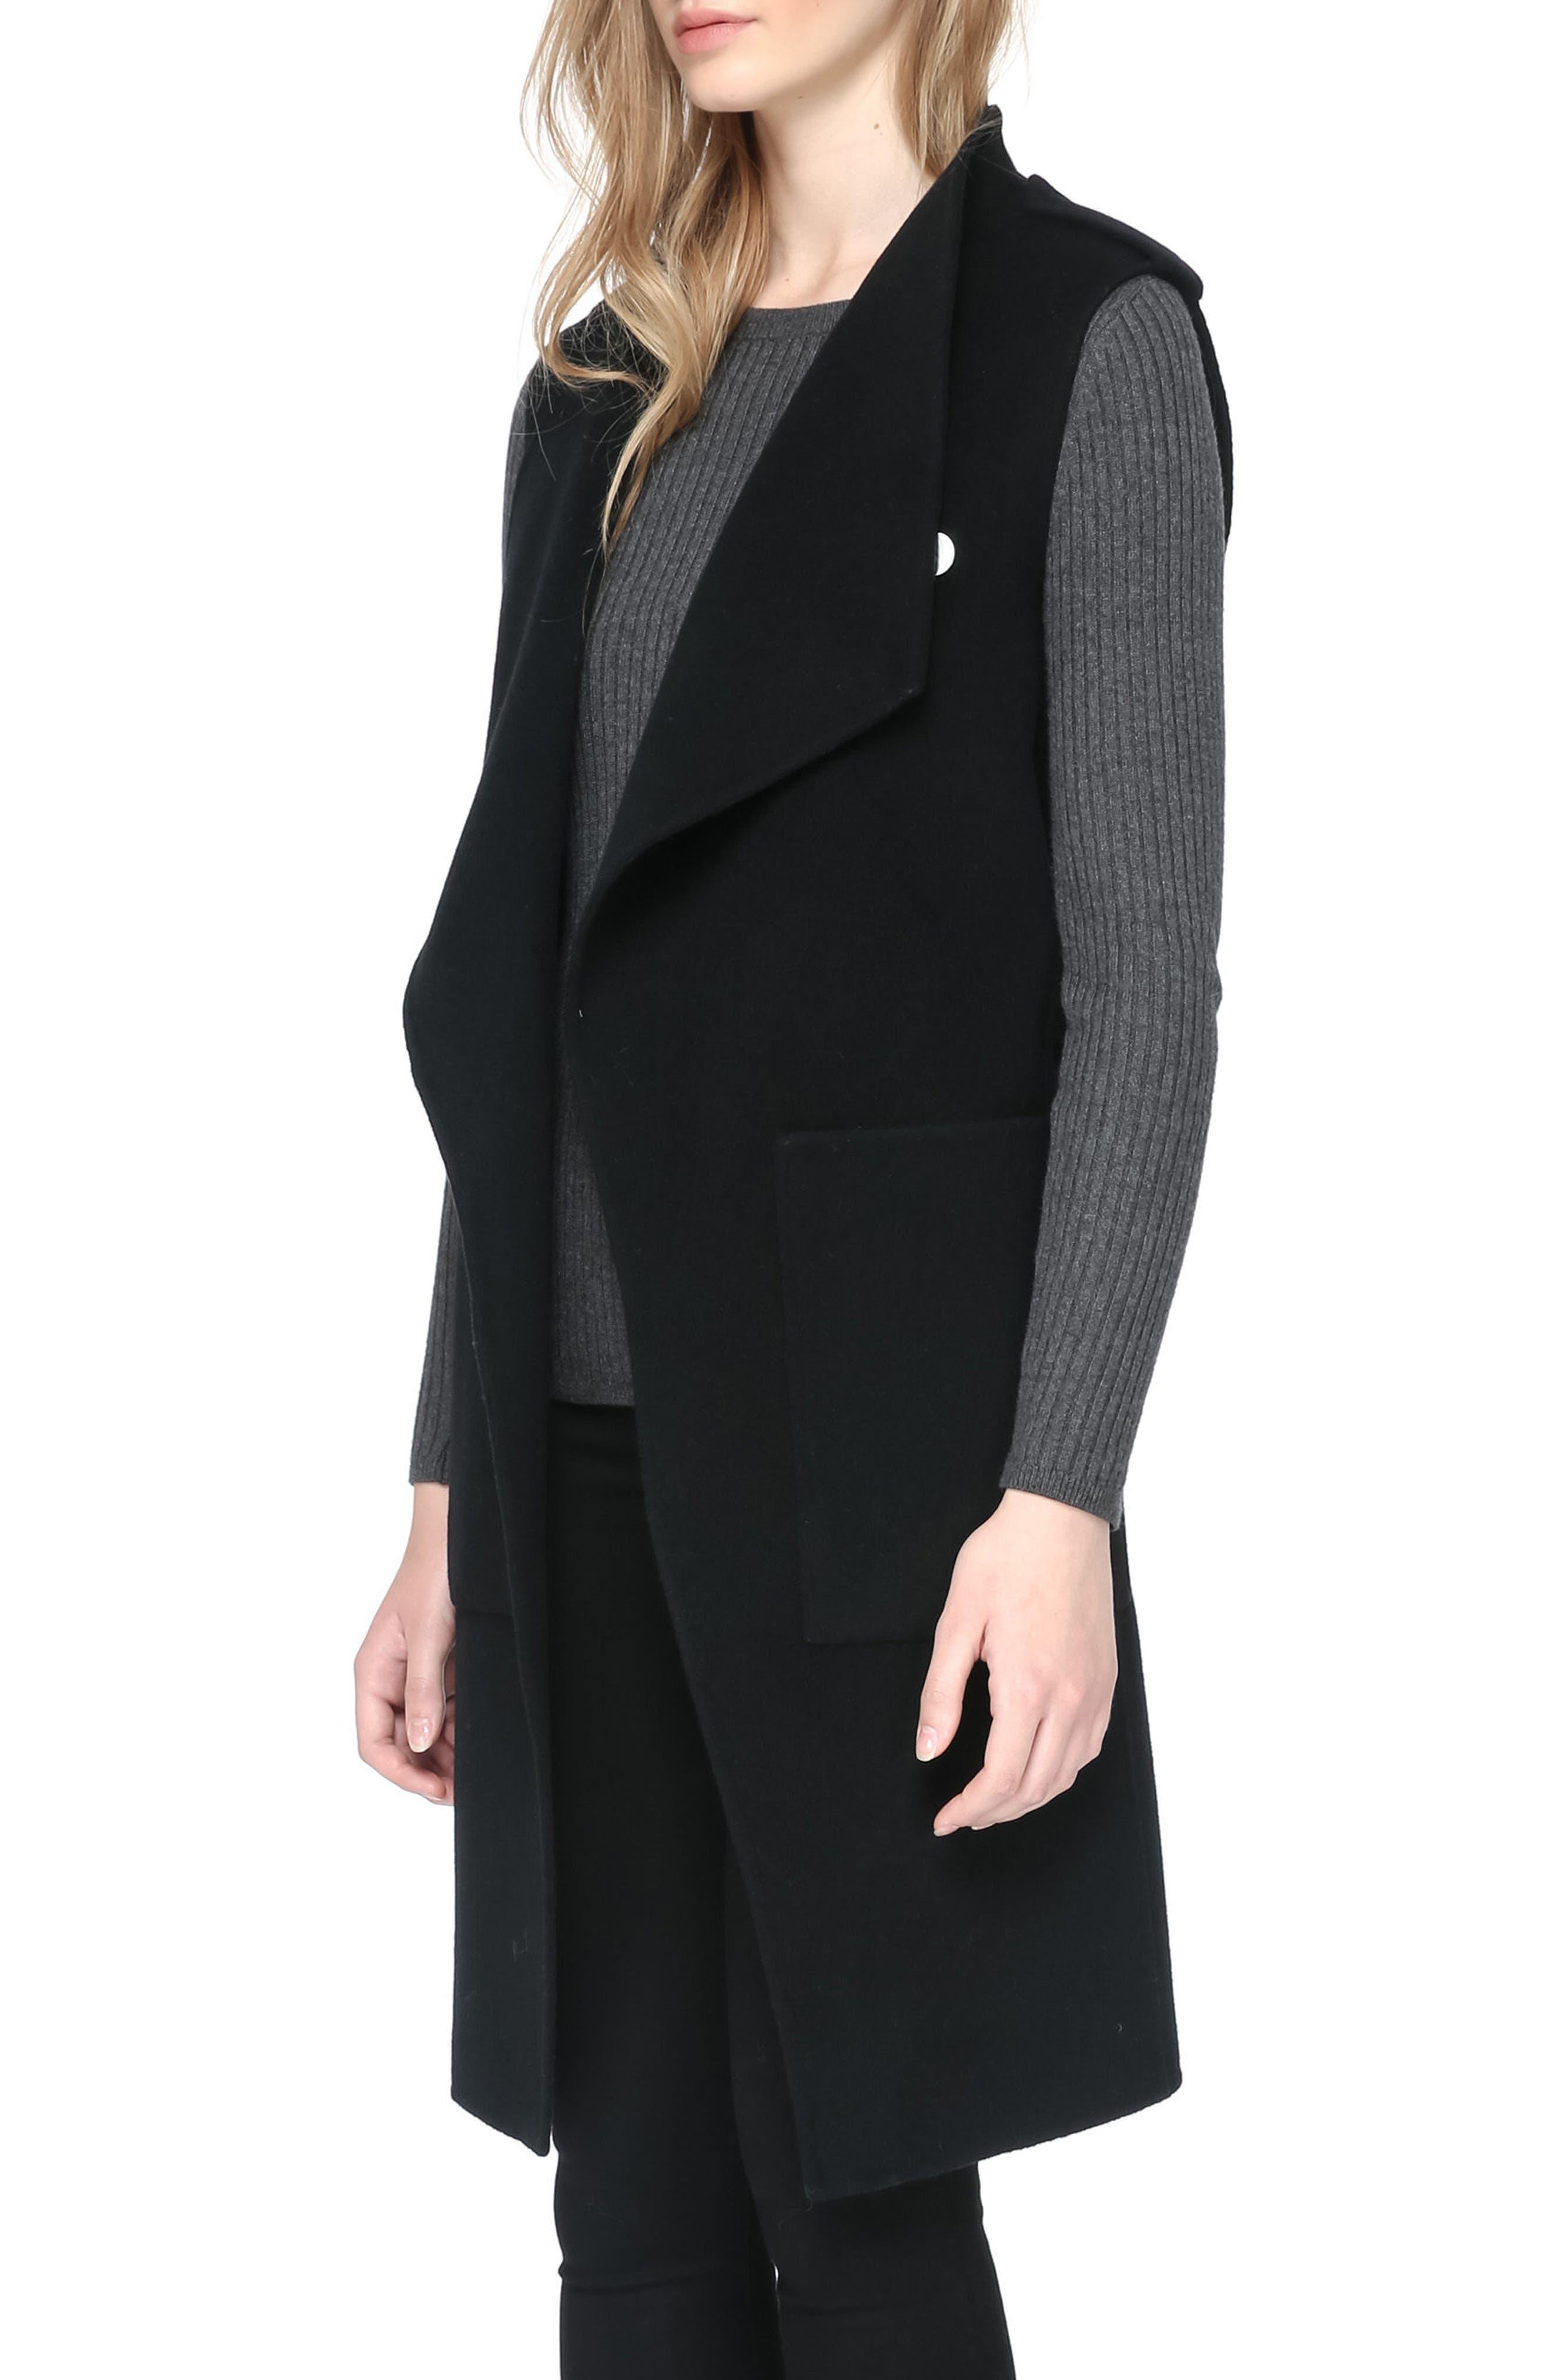 SOIA & KYO, Reversible Wool Blend Vest, Alternate thumbnail 3, color, 001